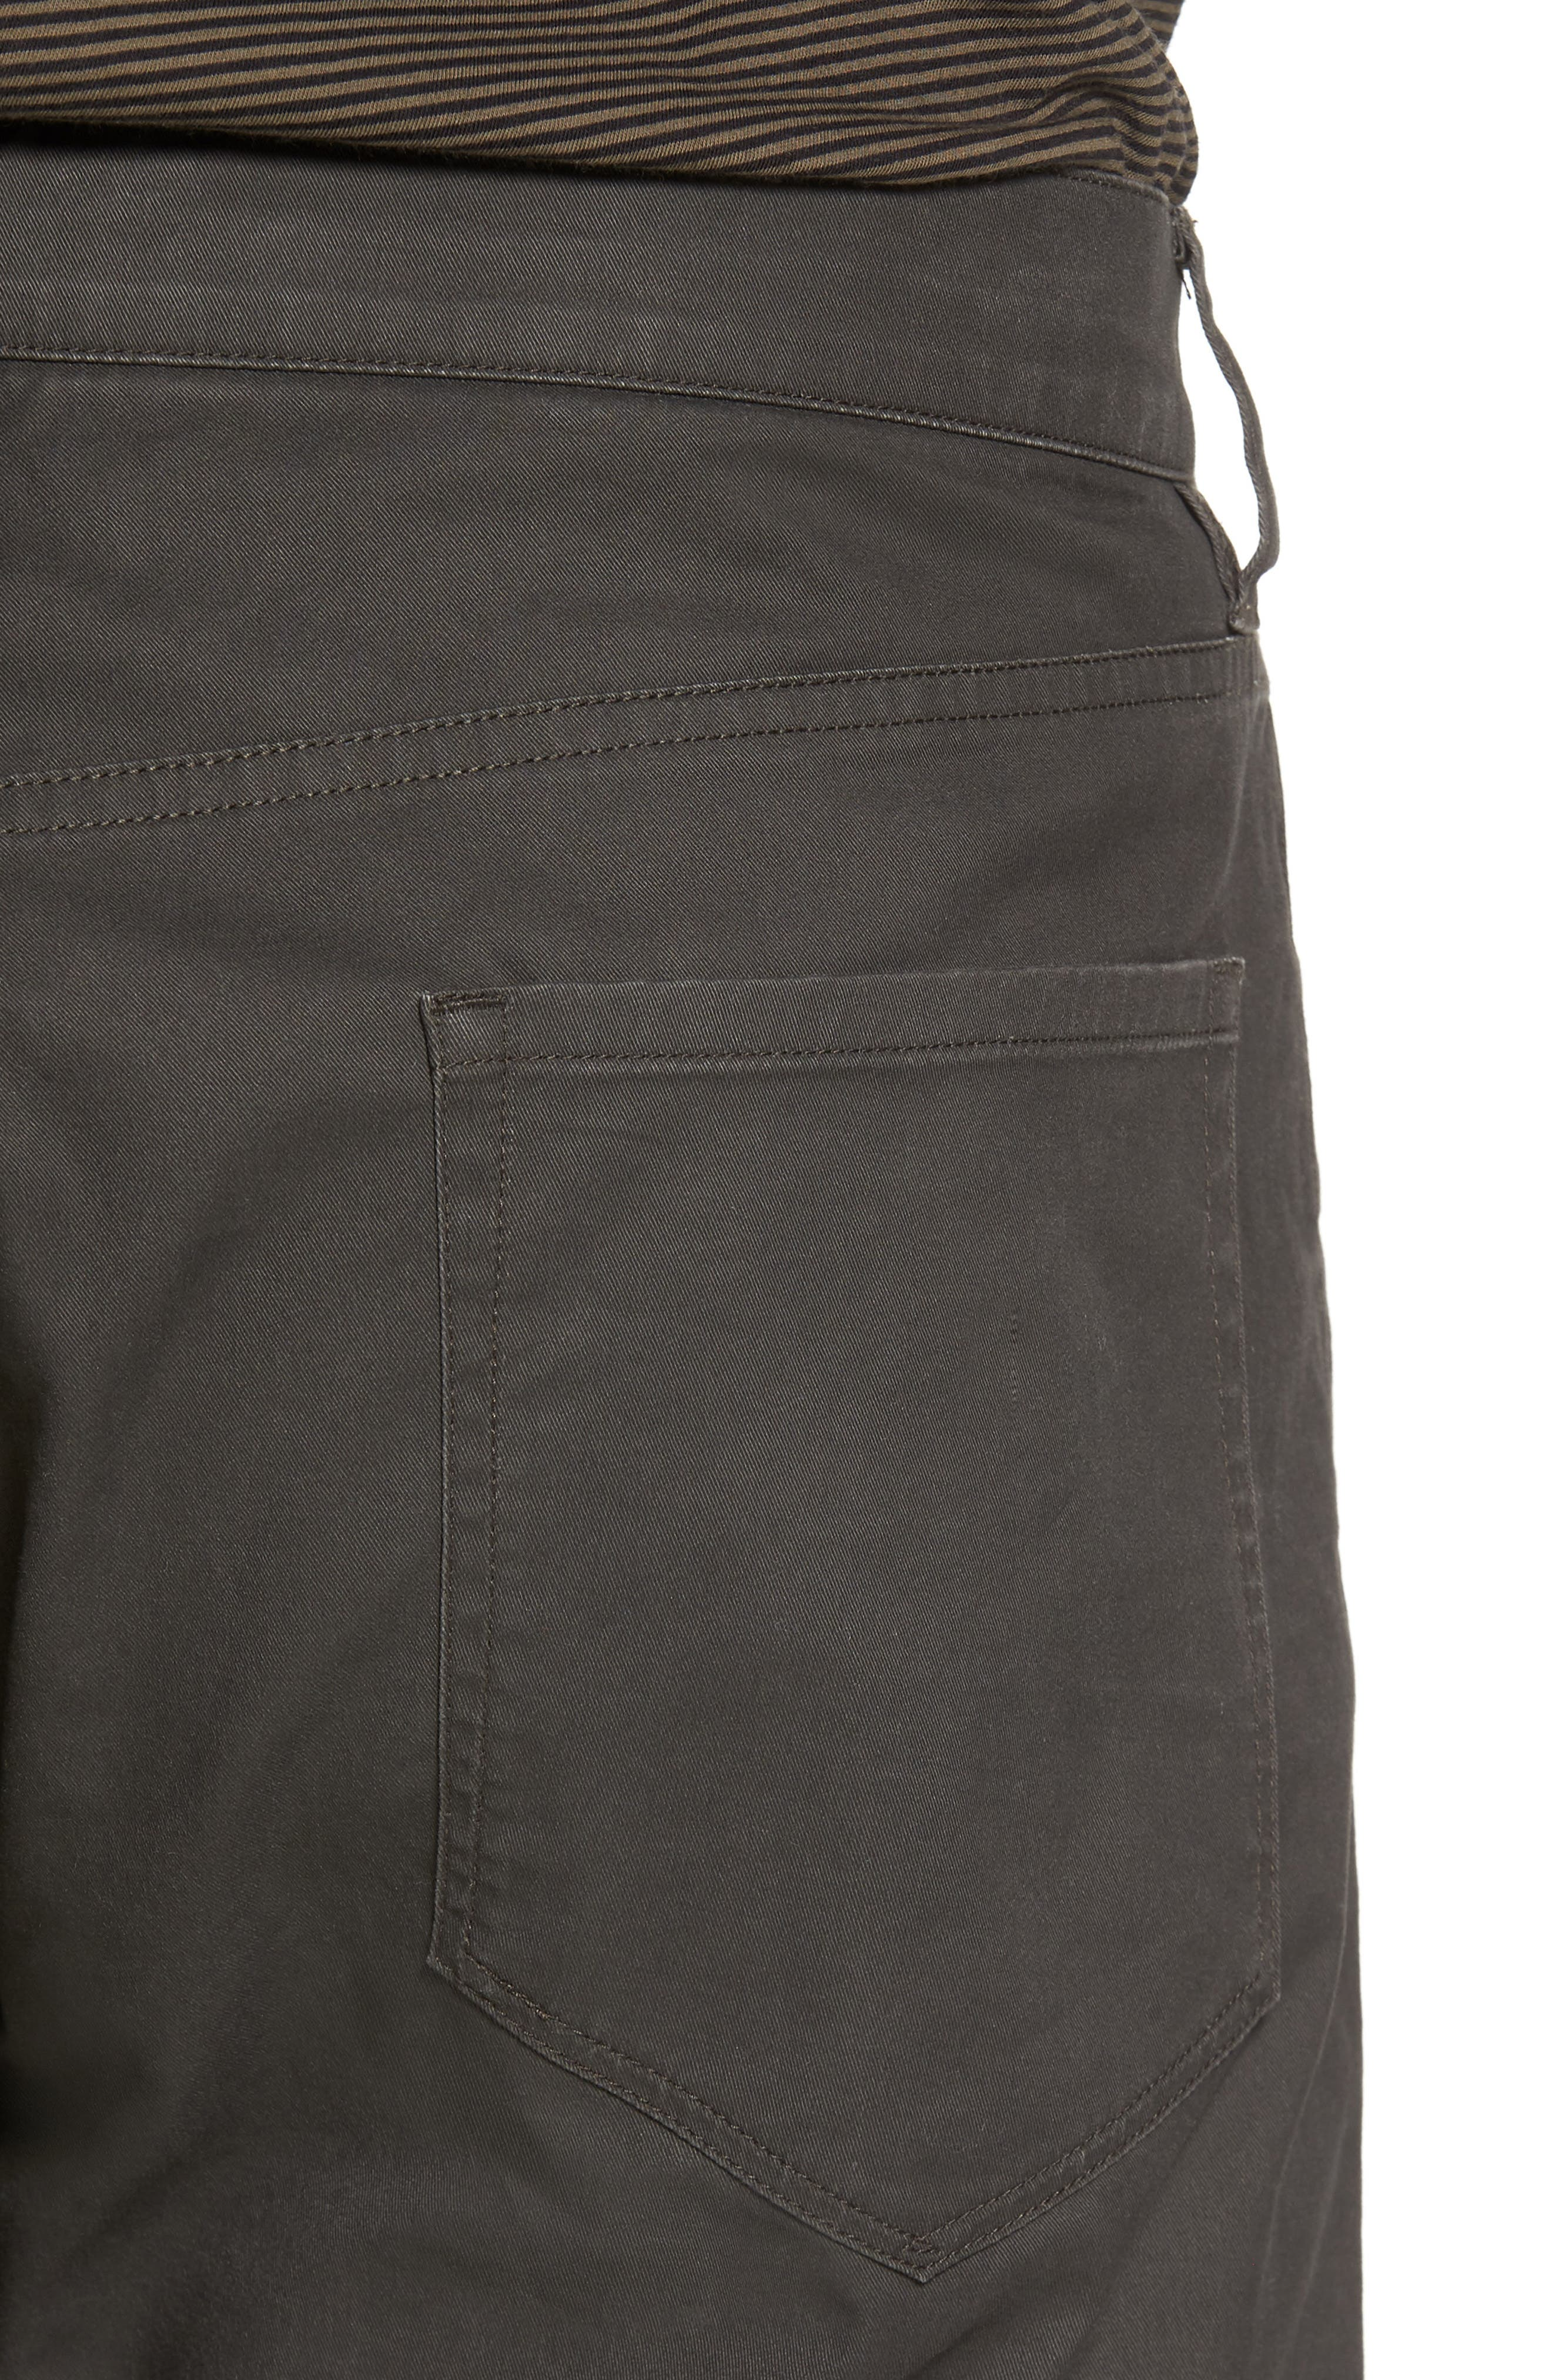 Slim Fit Five-Pocket Pants,                             Alternate thumbnail 4, color,                             020